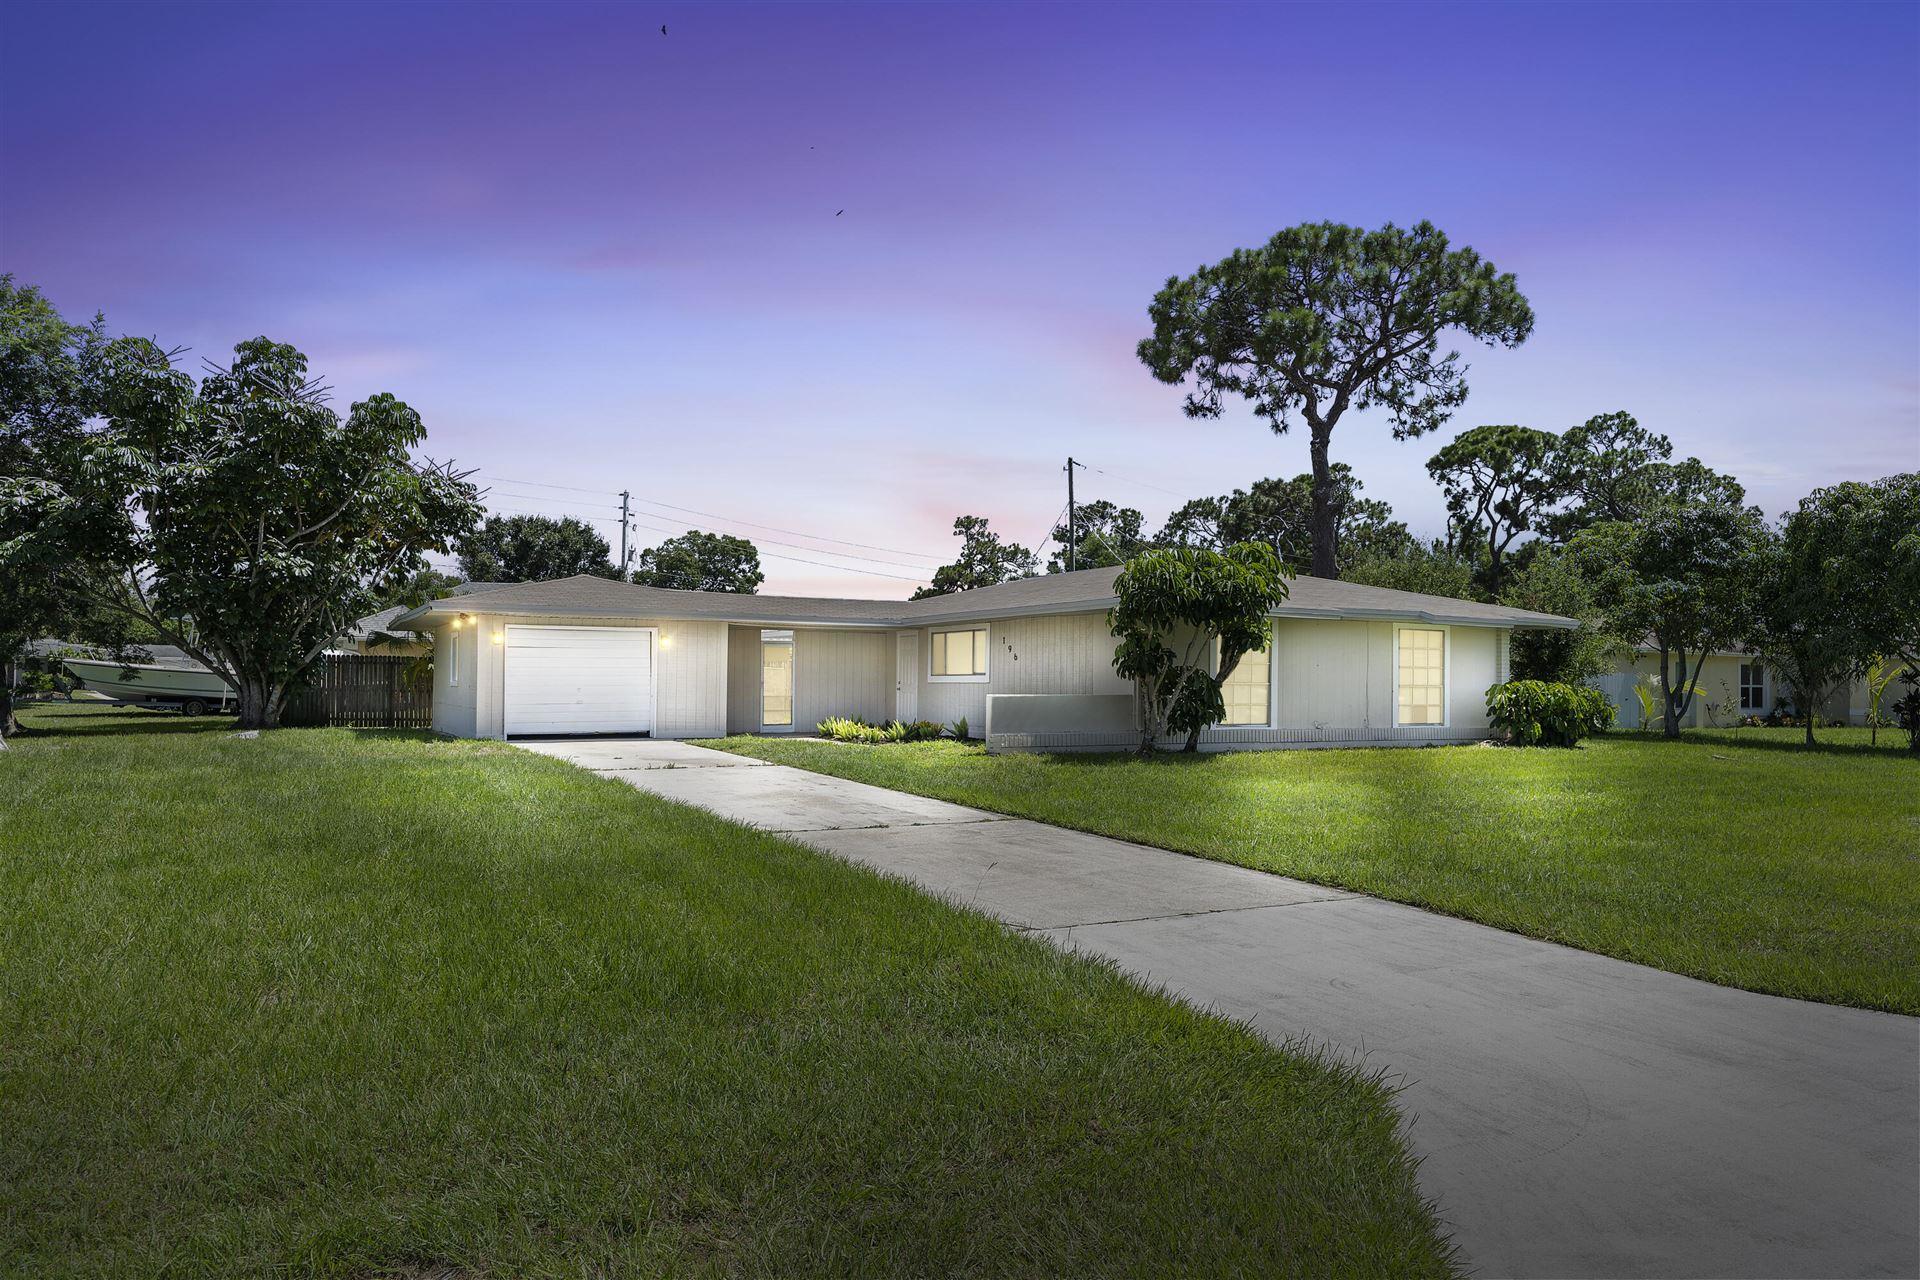 196 NE Caprona Avenue, Port Saint Lucie, FL 34952 - MLS#: RX-10731589